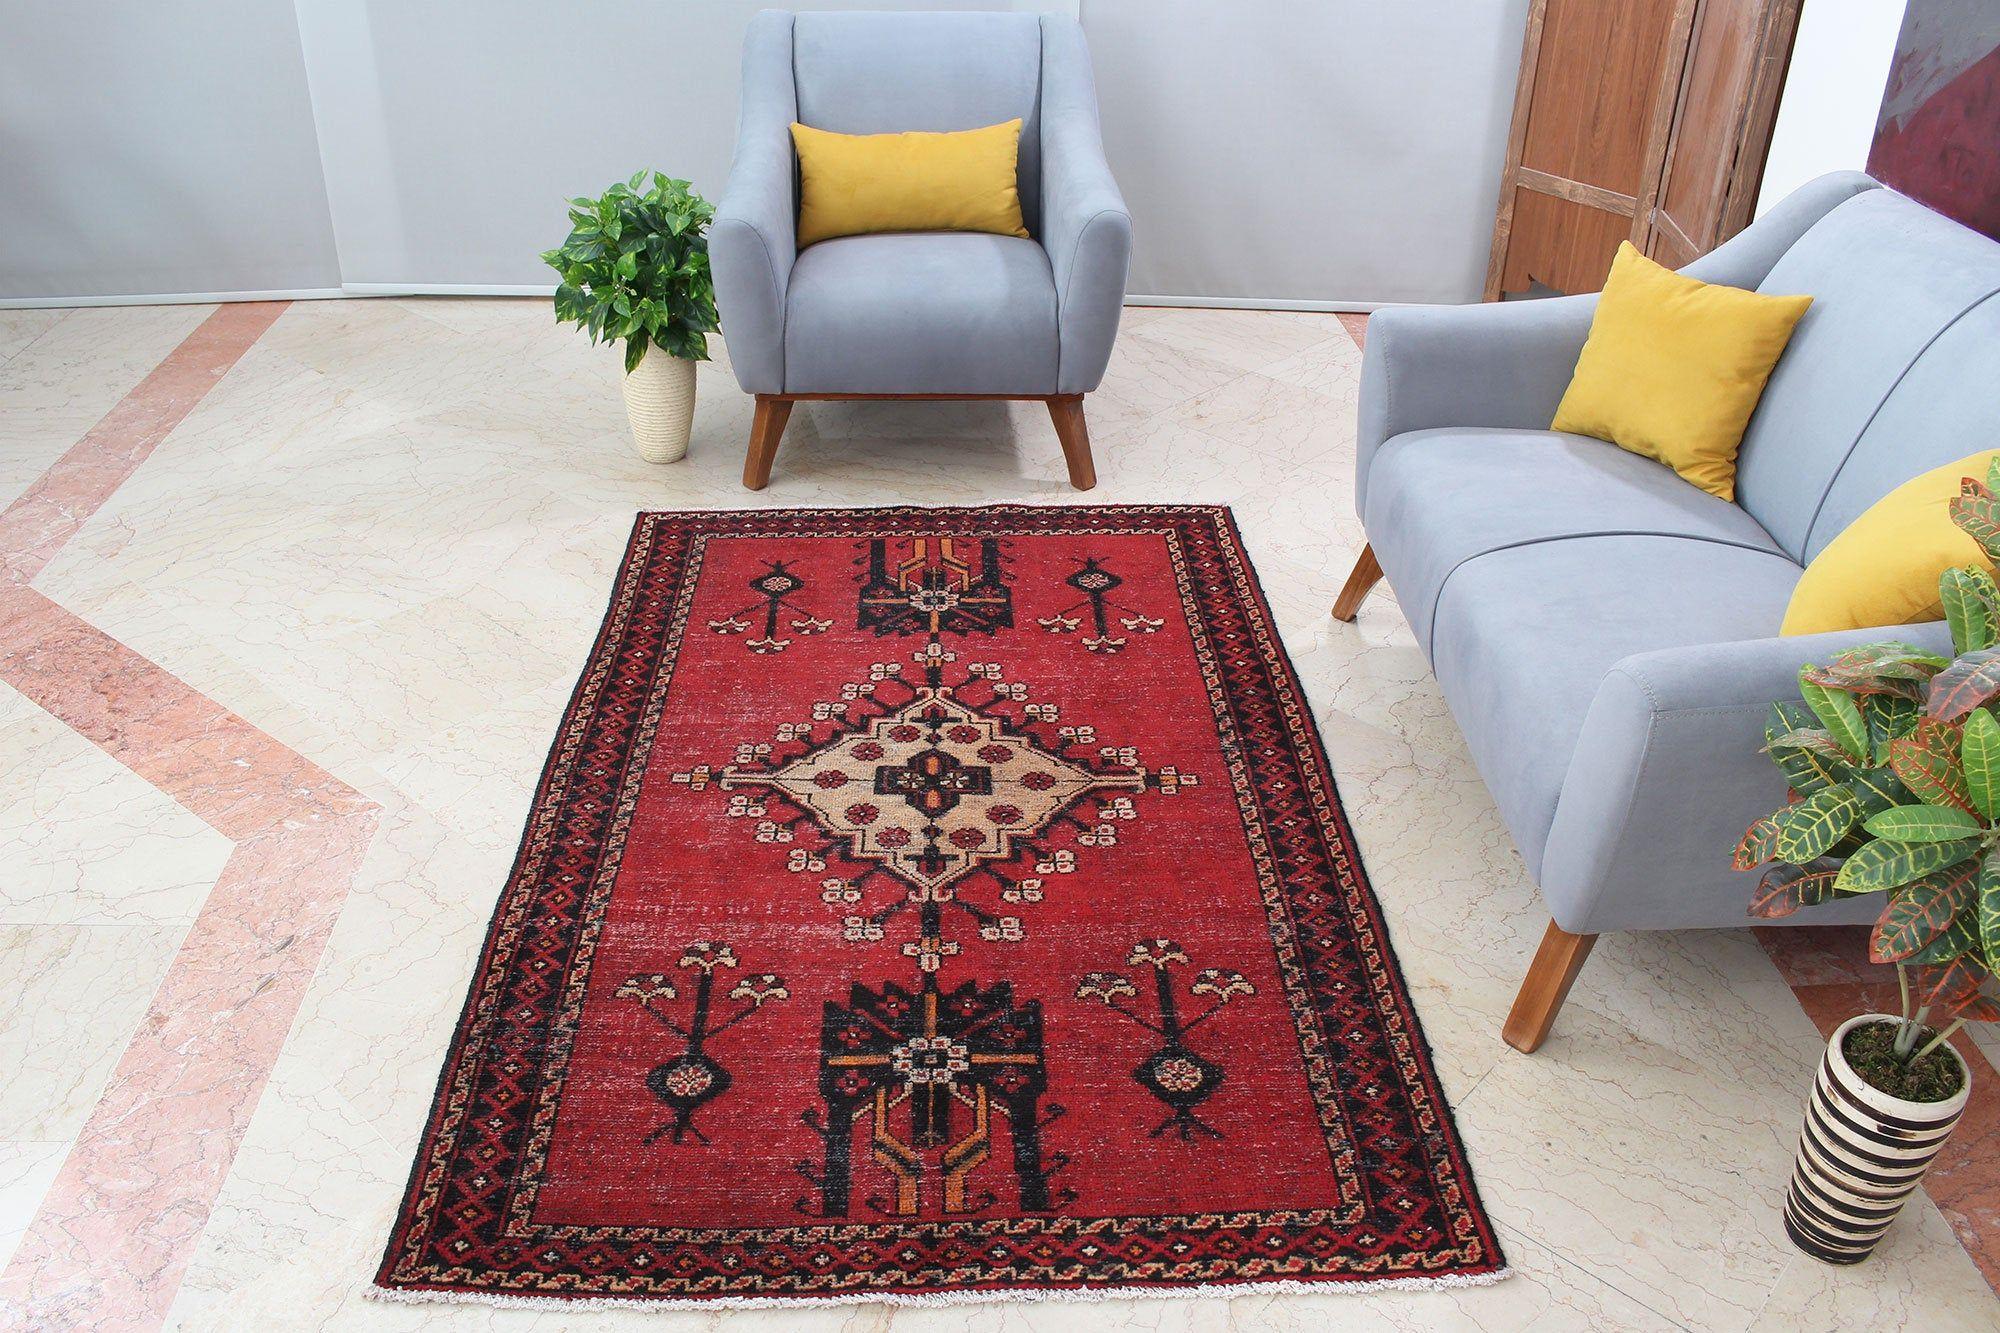 Geometric Oriental Handmade Turkish Area Rug 4x6 Traditional Etsy 4x6 Area Rugs Vintage Rugs Classic Home Decor